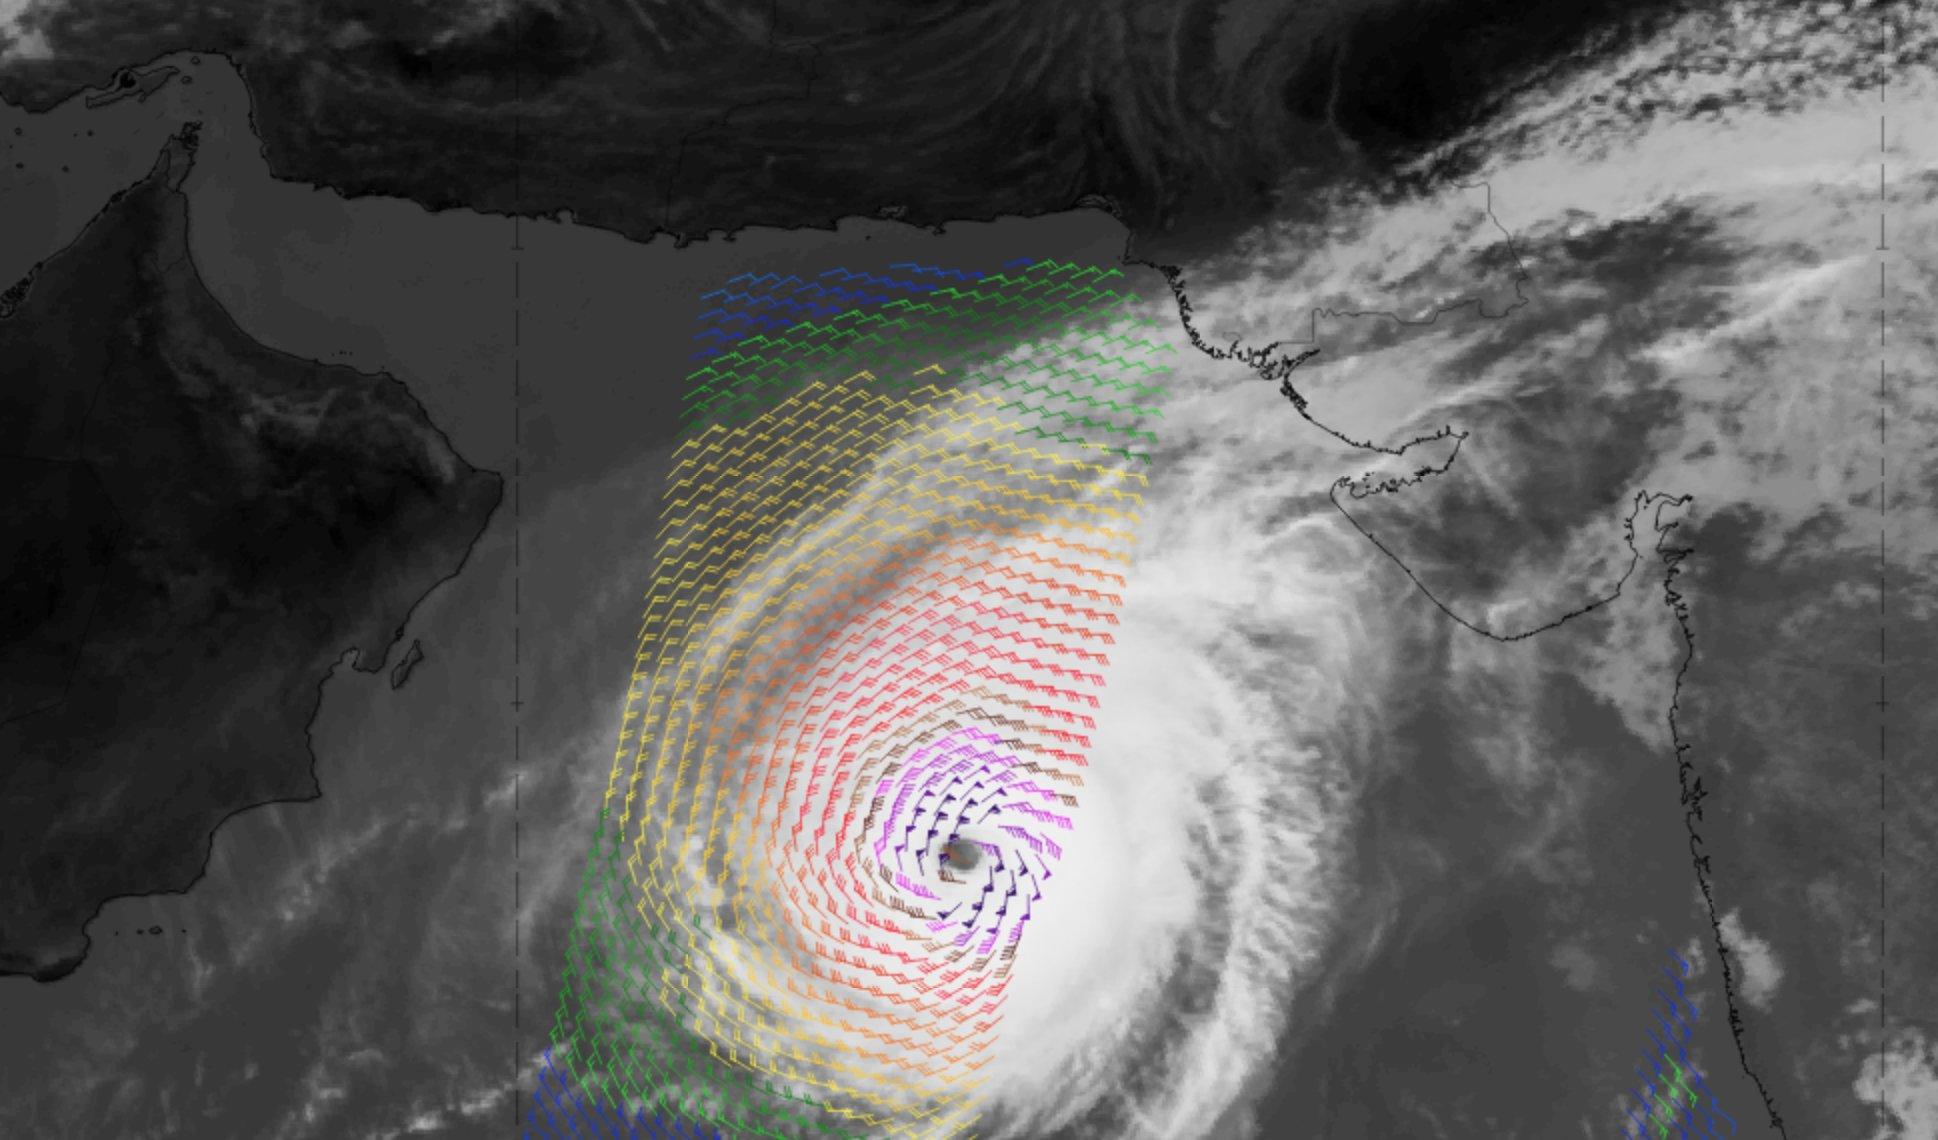 Meteosat-8 IR10.8 image with Metop-A ASCAT winds overlaid, 28 Oct 06:00 UTC